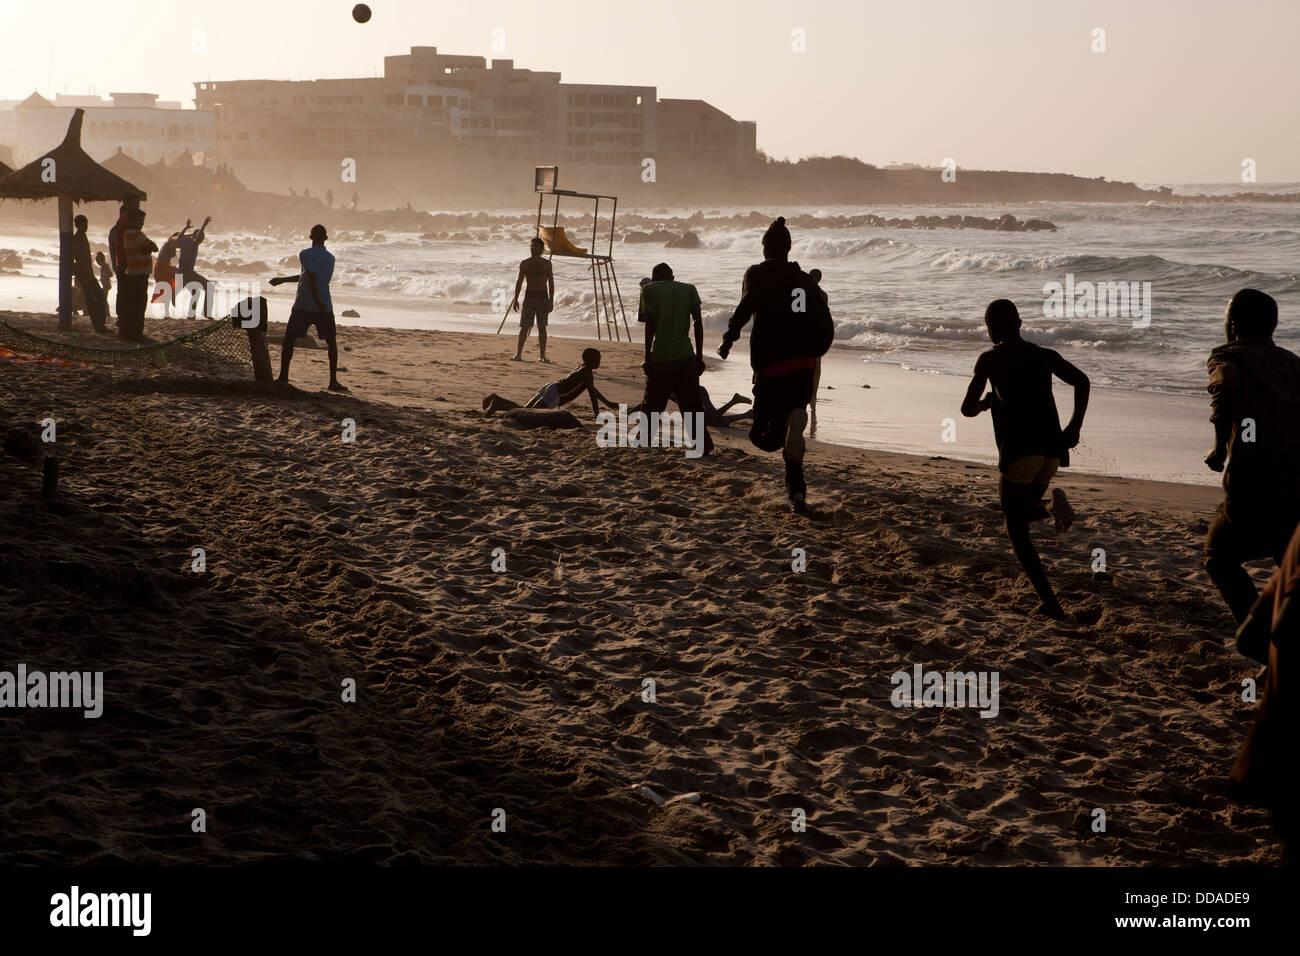 Beach life in Dakar, Senegal. - Stock Image